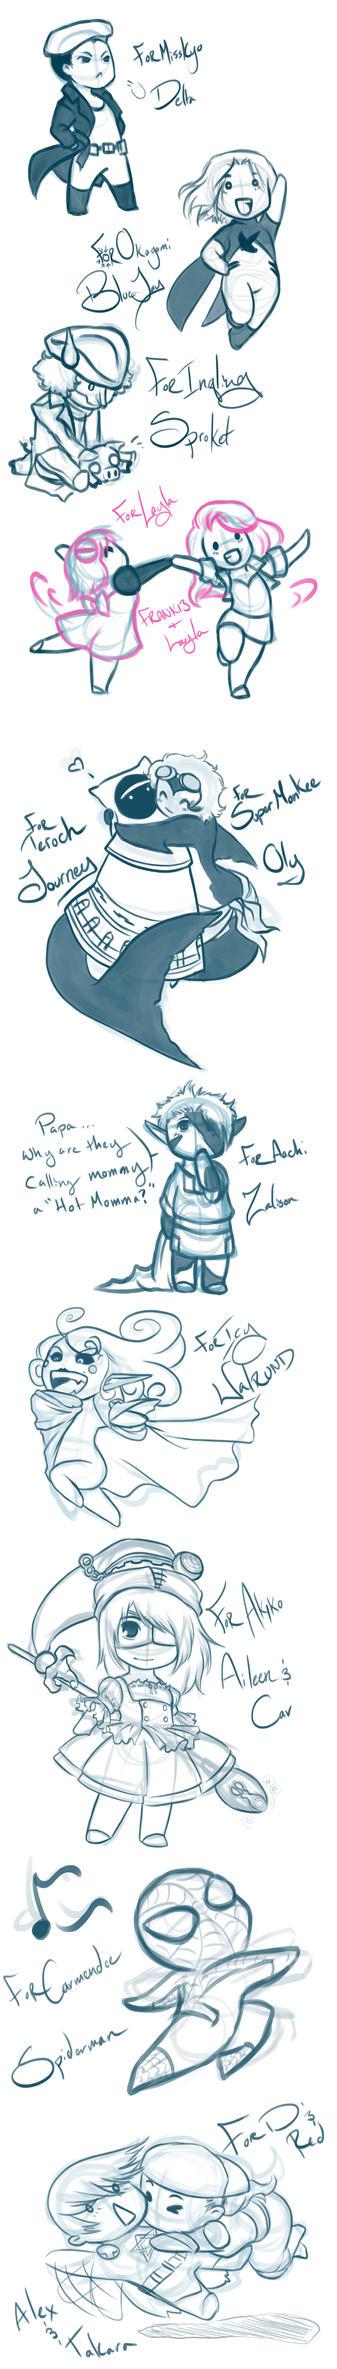 Sketch Requests12-29-12 by Yokoboo